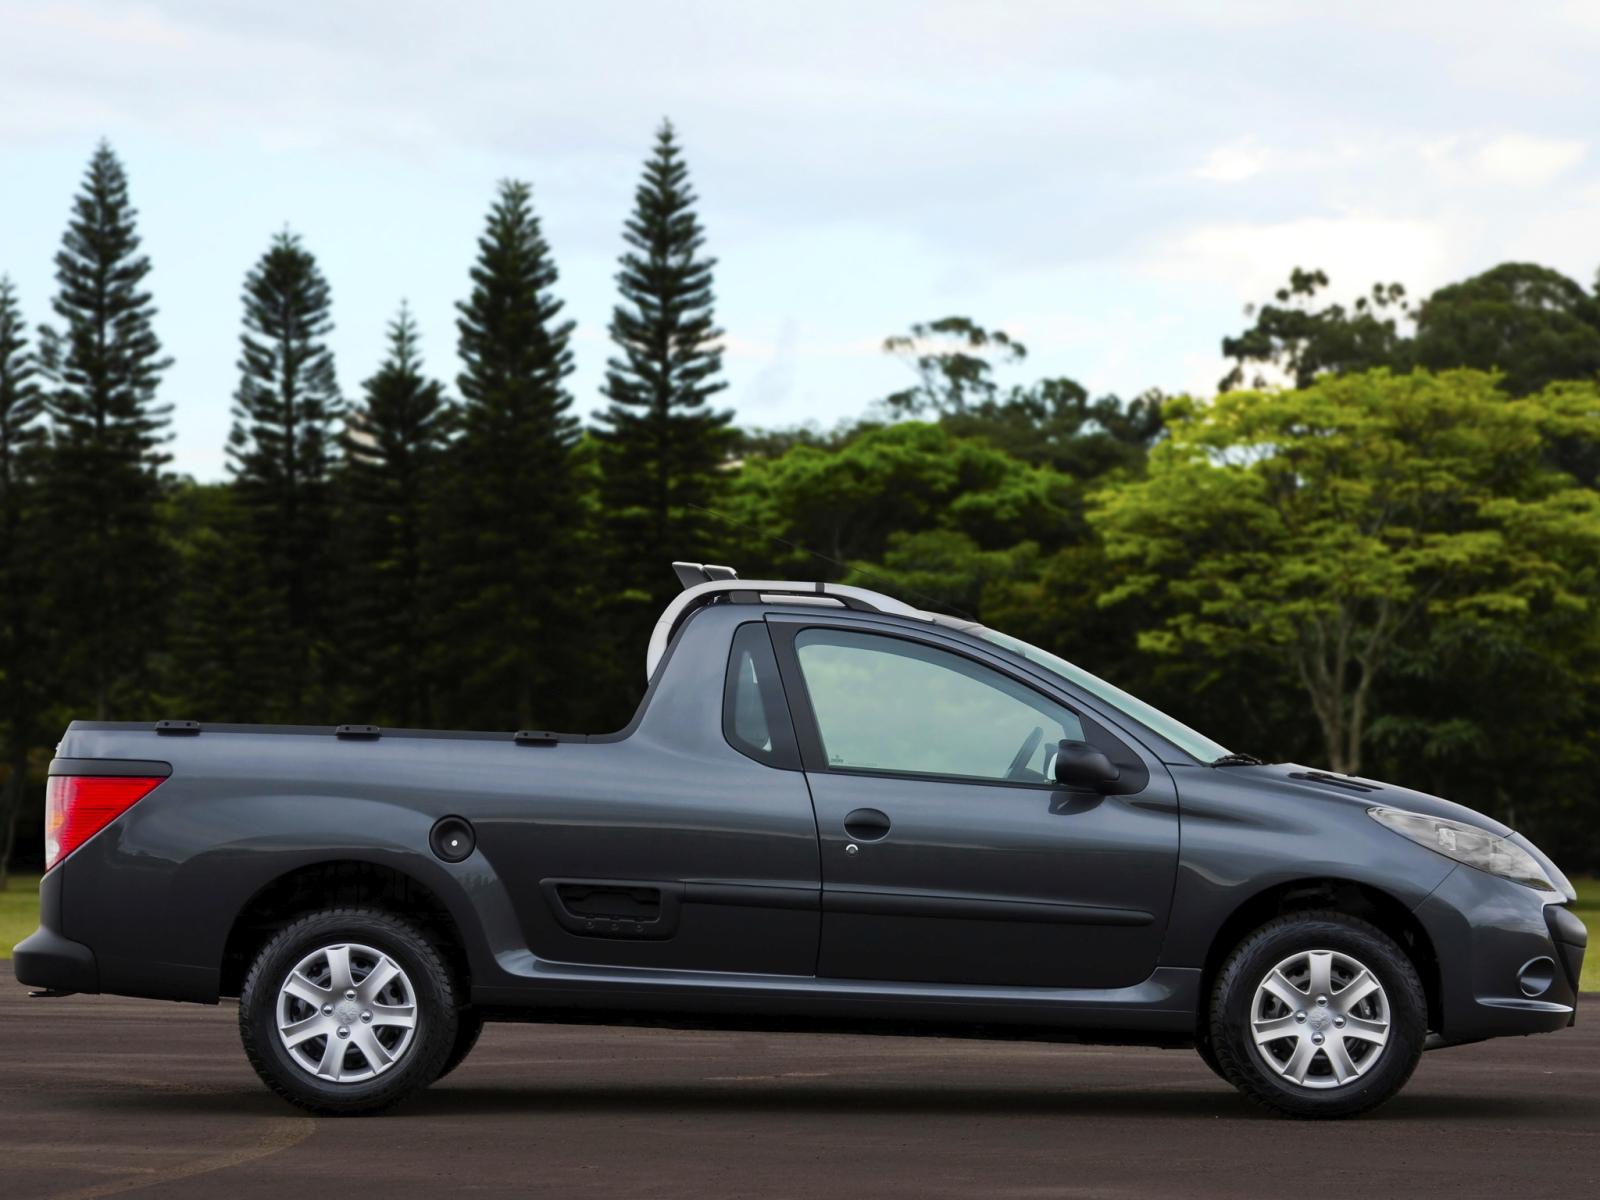 Pickupot fejleszt a Peugeot